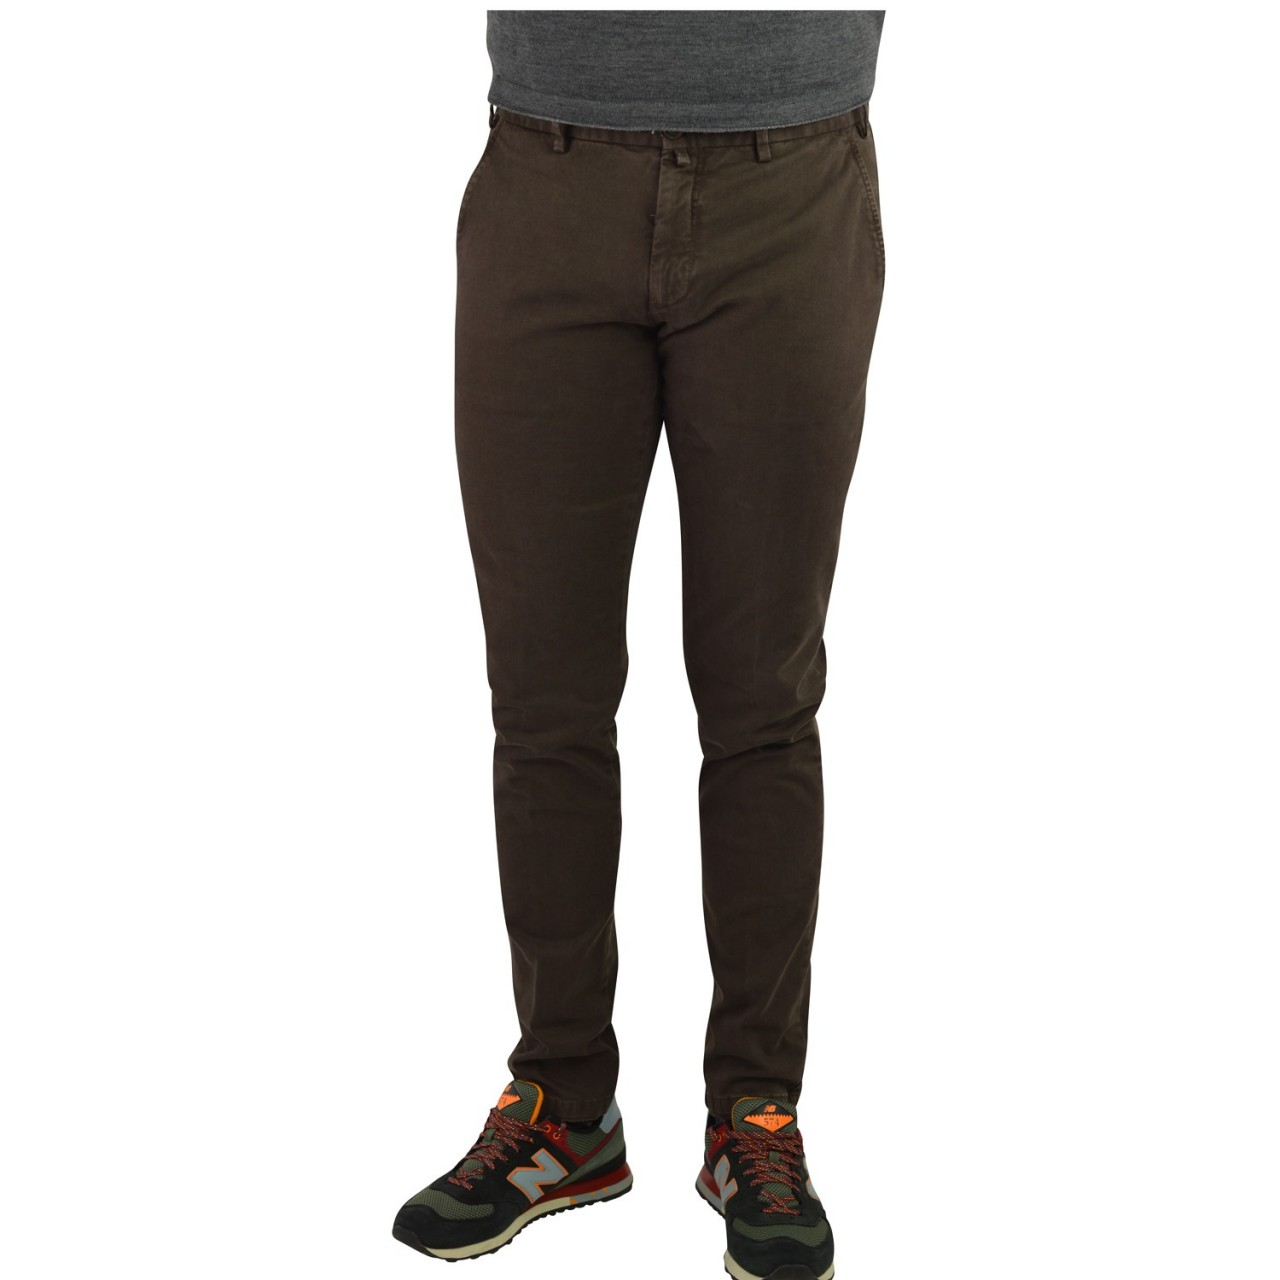 Verdera Pantalone Verdera Uomo Tessuto Invecchiato Tasca Amer 500137C